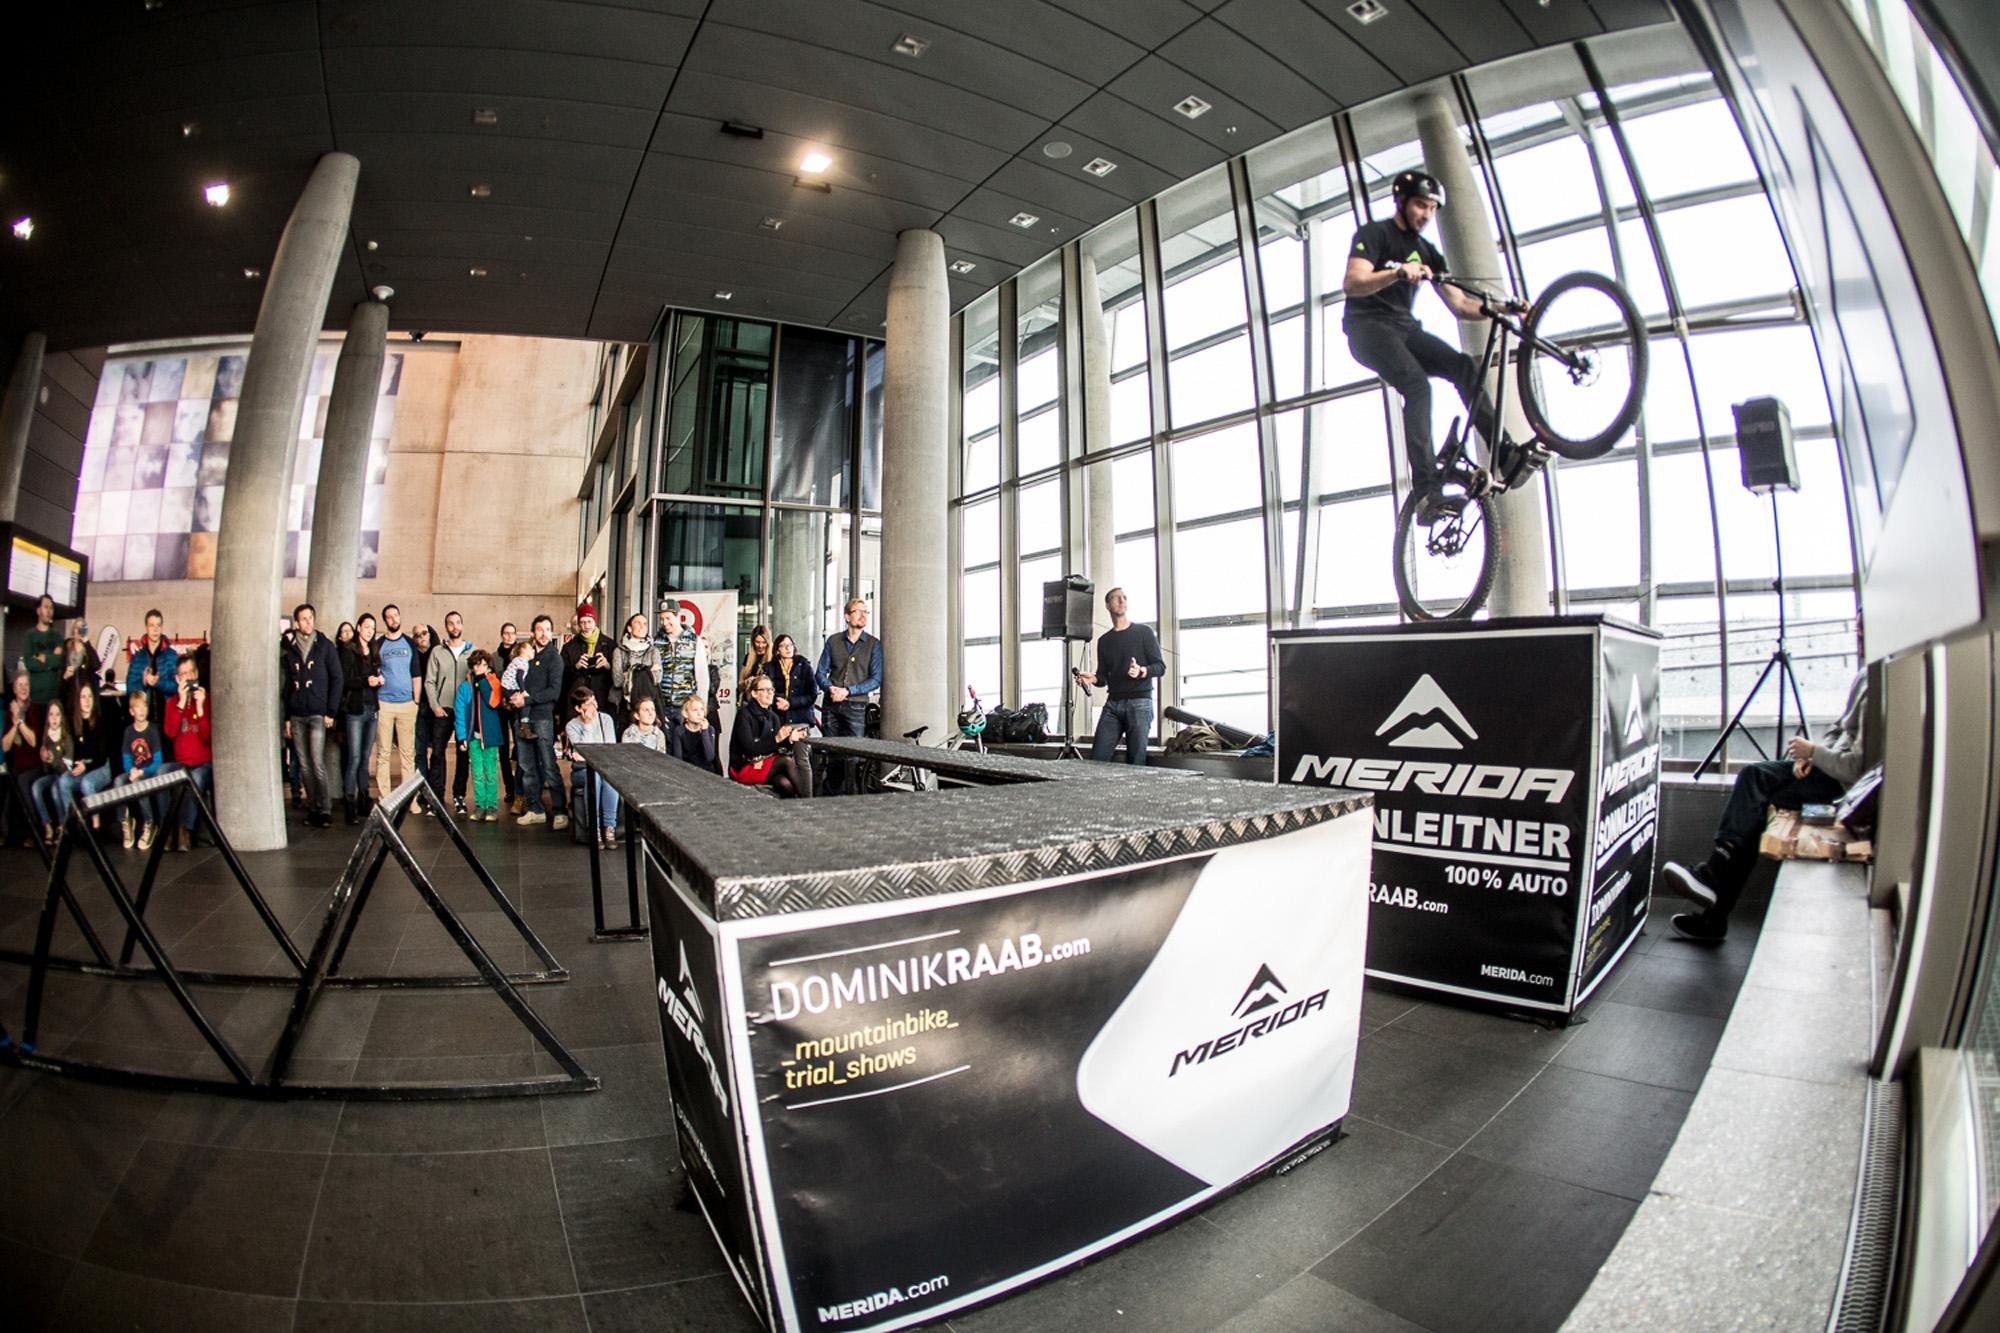 Dominik Raab hüpft am Hinterrad bei seiner Show